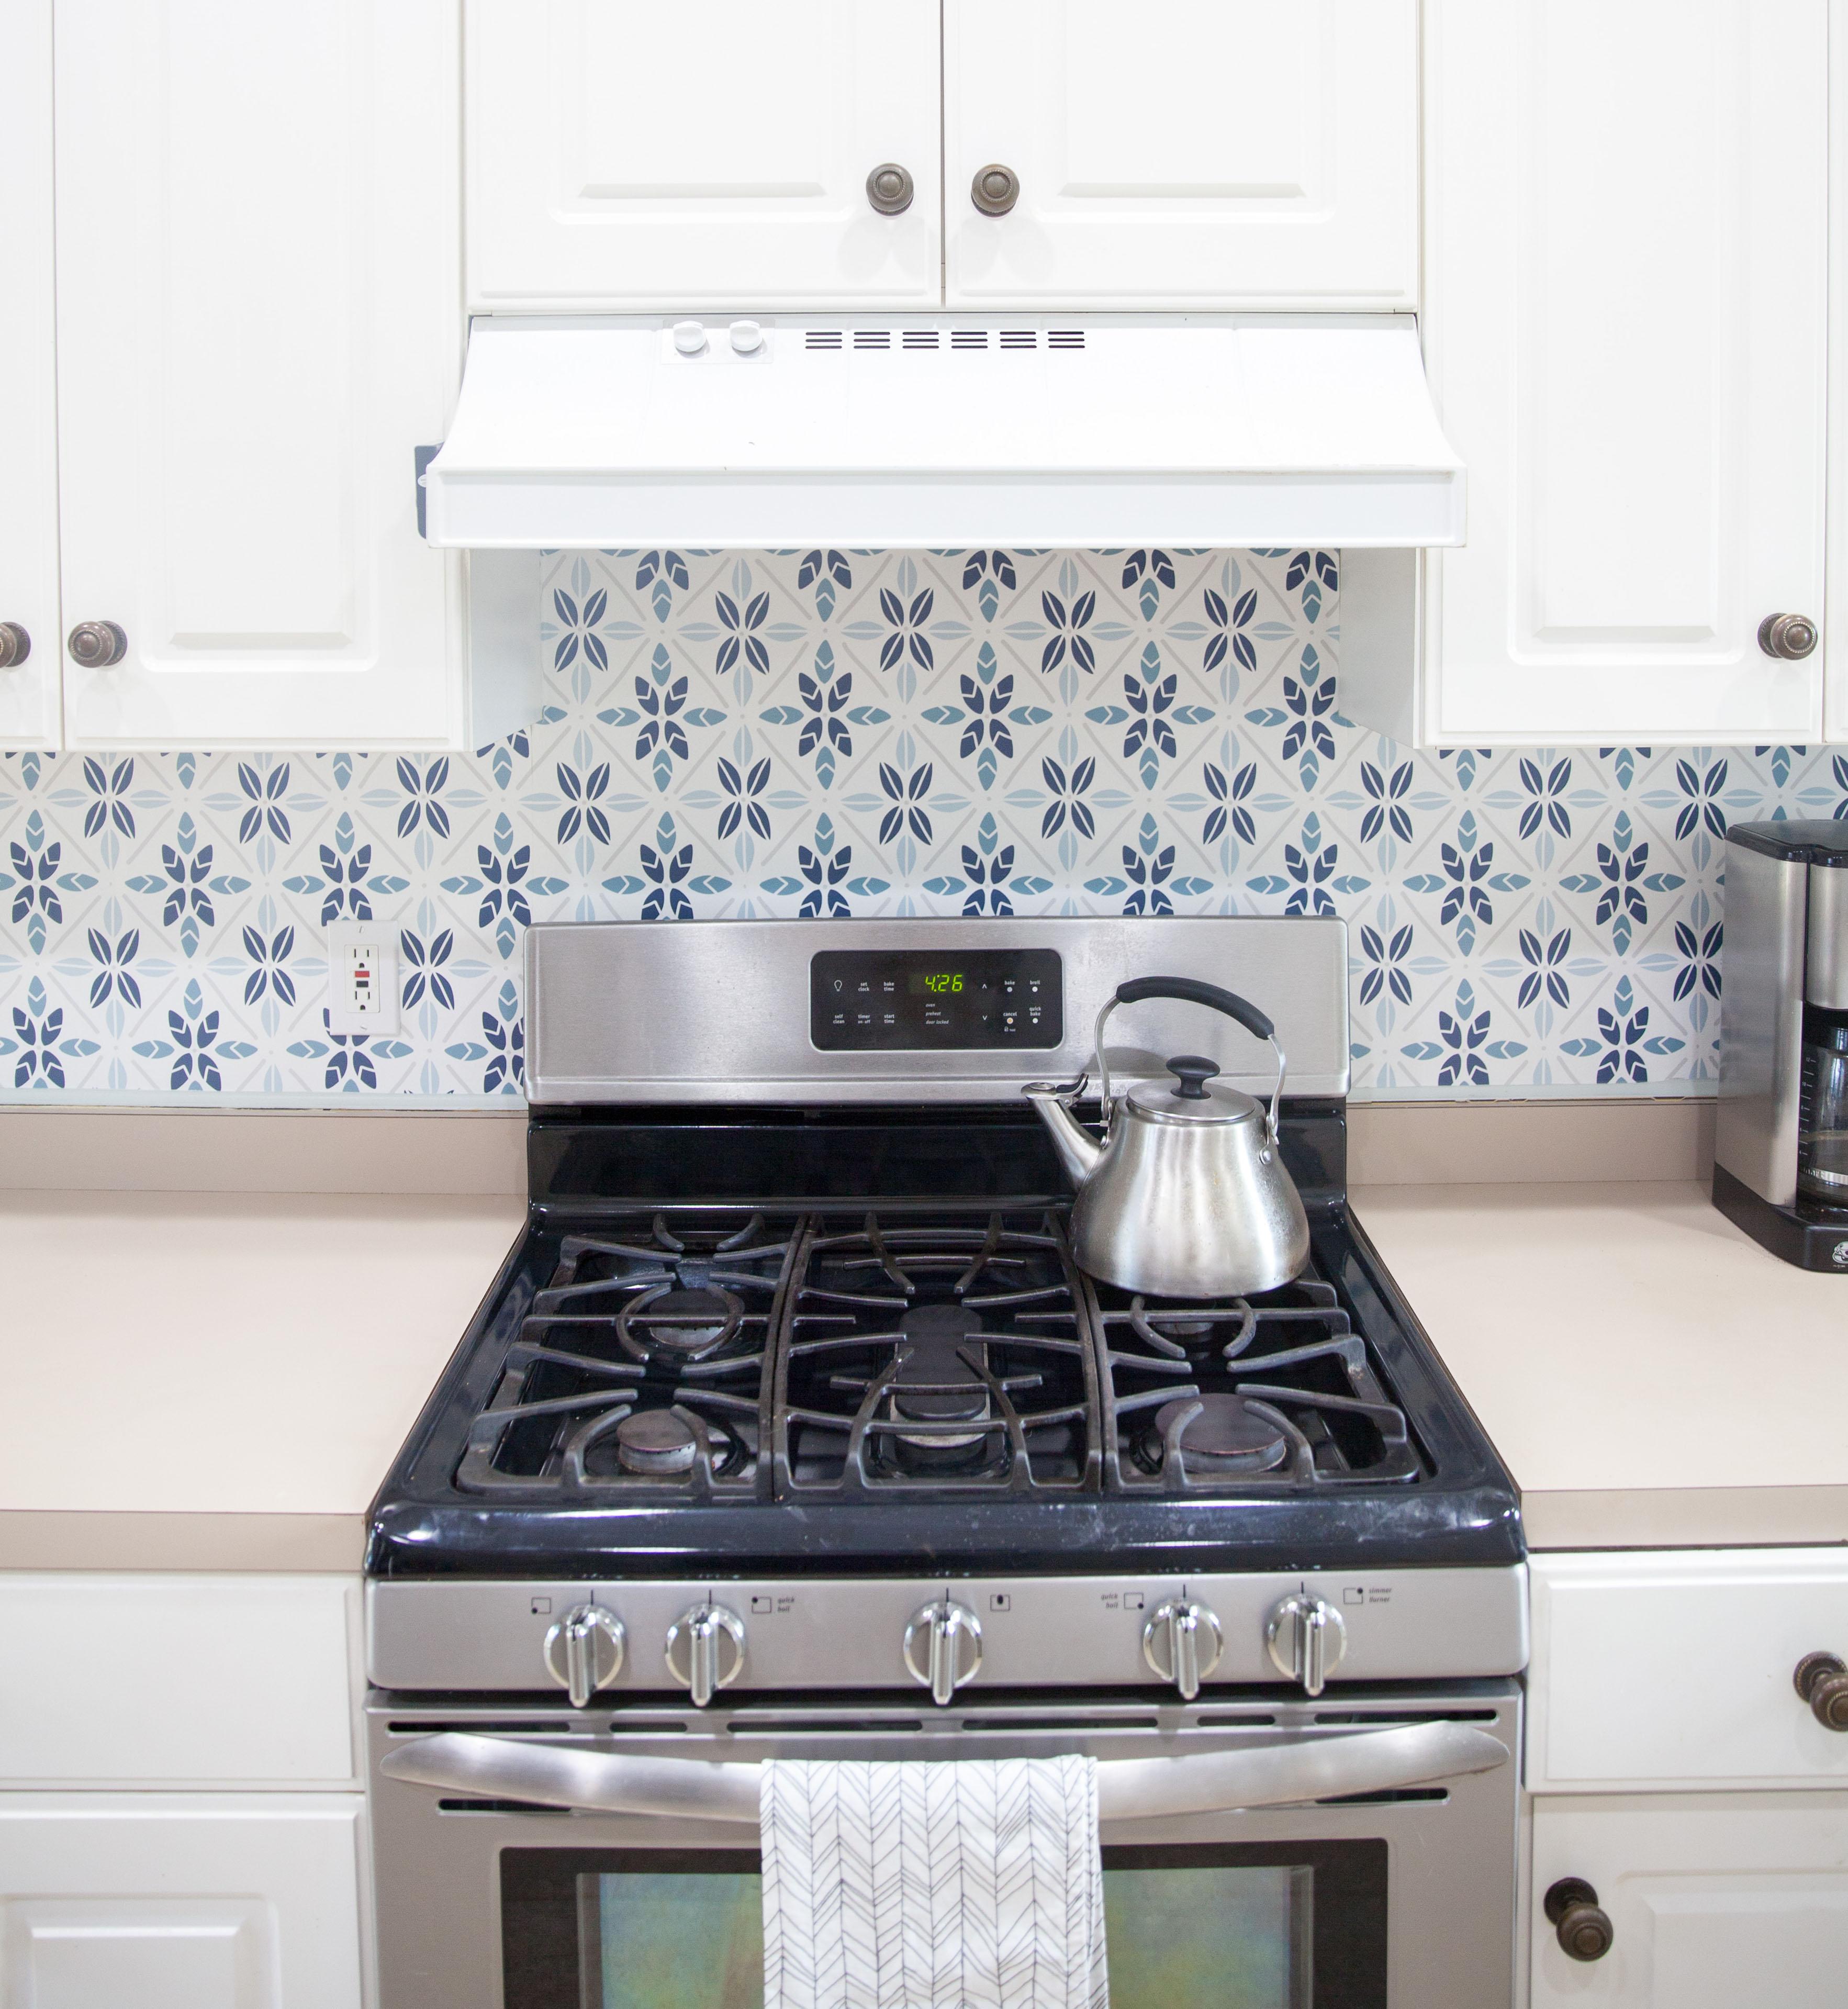 Easy Faux Tile Backsplash with Eco Friendly Wallpaper 3531x3838